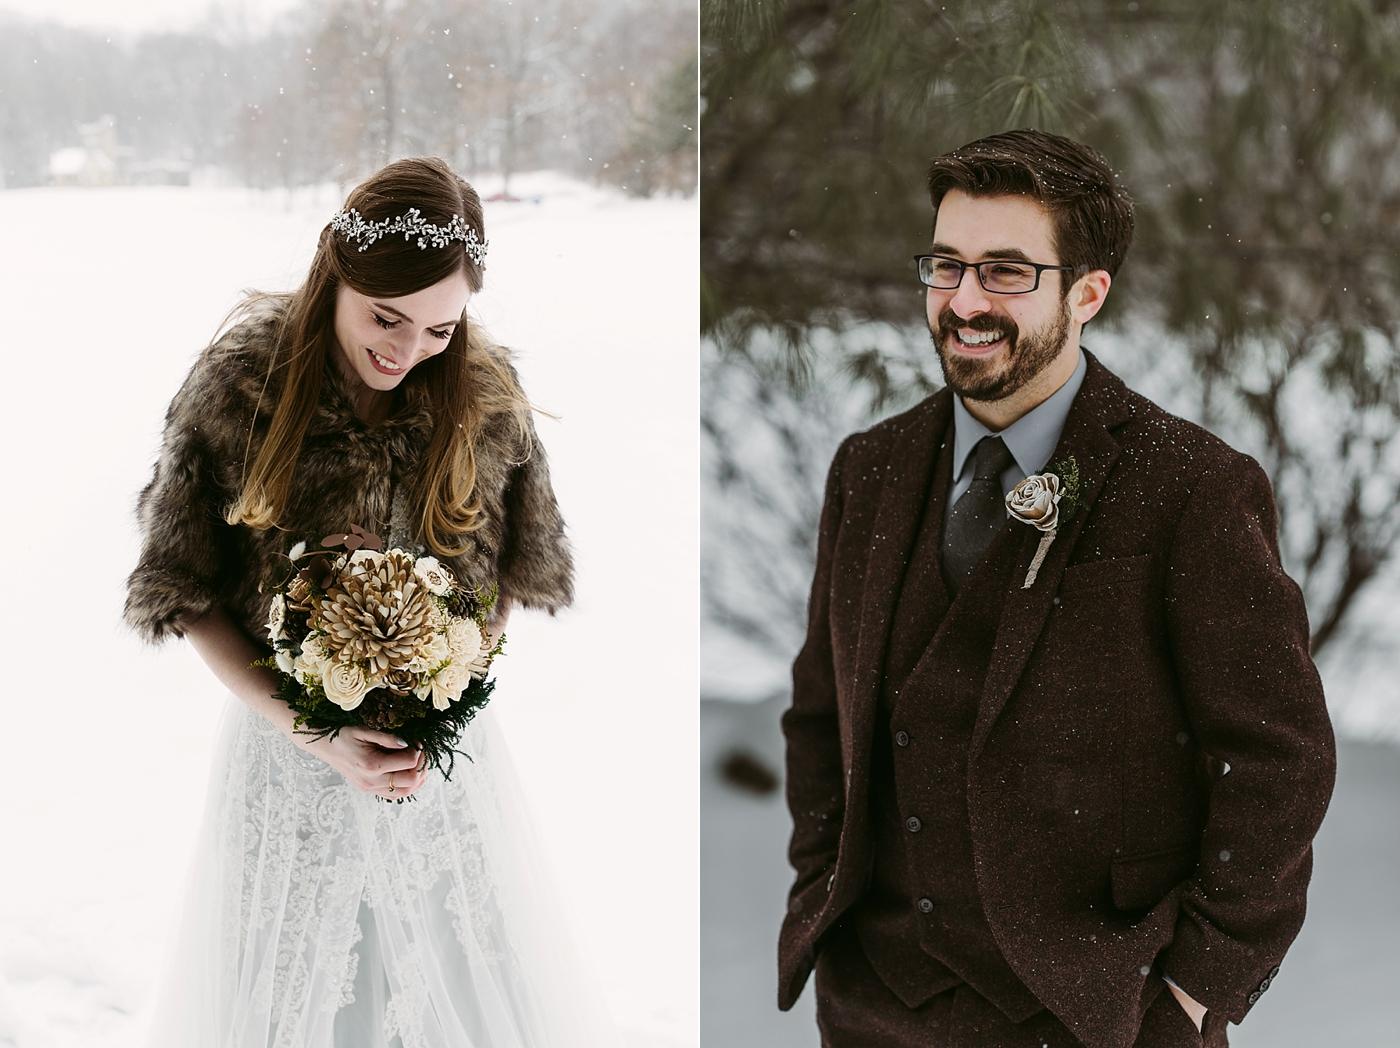 Winter-Squires-Castle-Wedding-James+Jessica_MJPHOTO2017-210.jpg